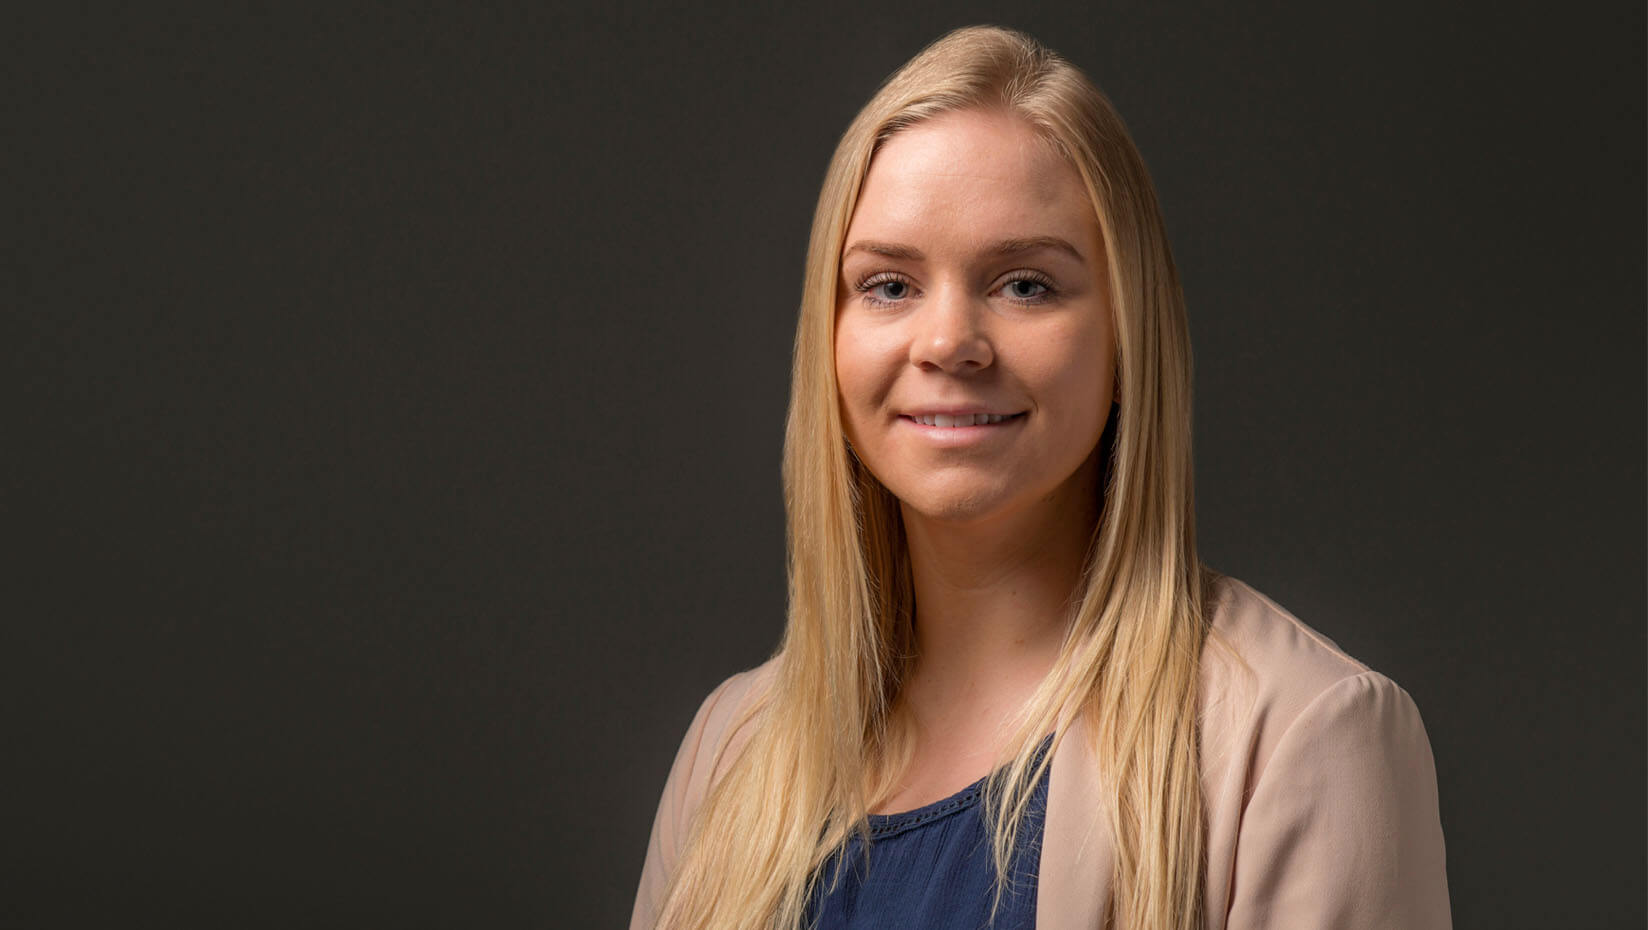 Mikaela Gustafsson